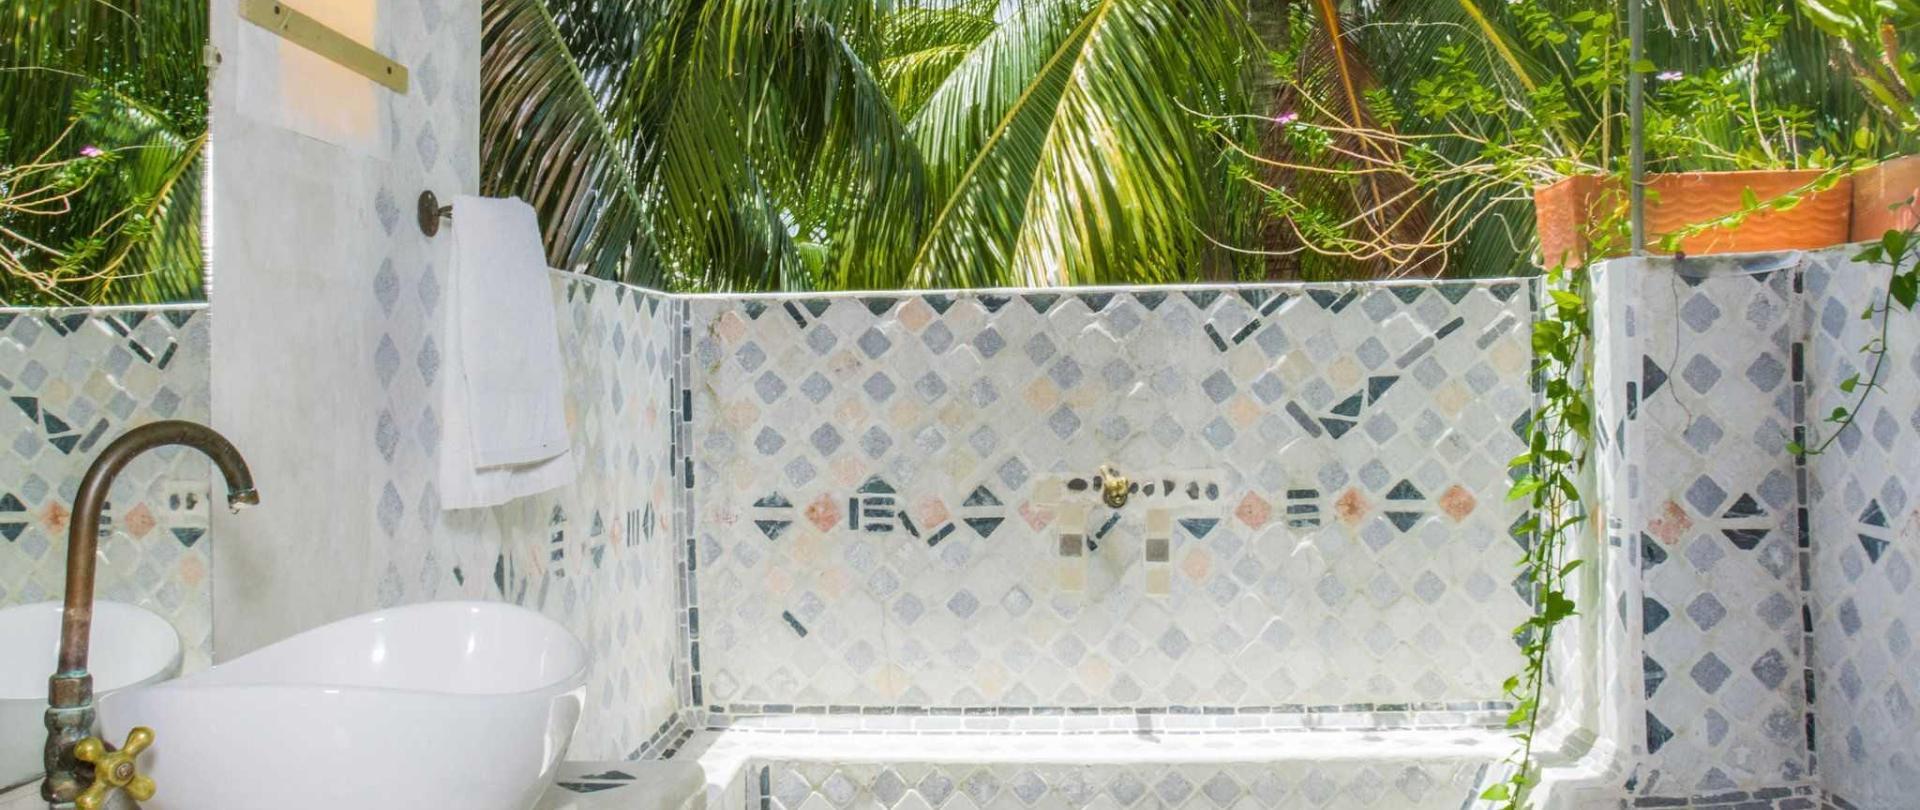 hotel-playa-manglares-21-1.jpg